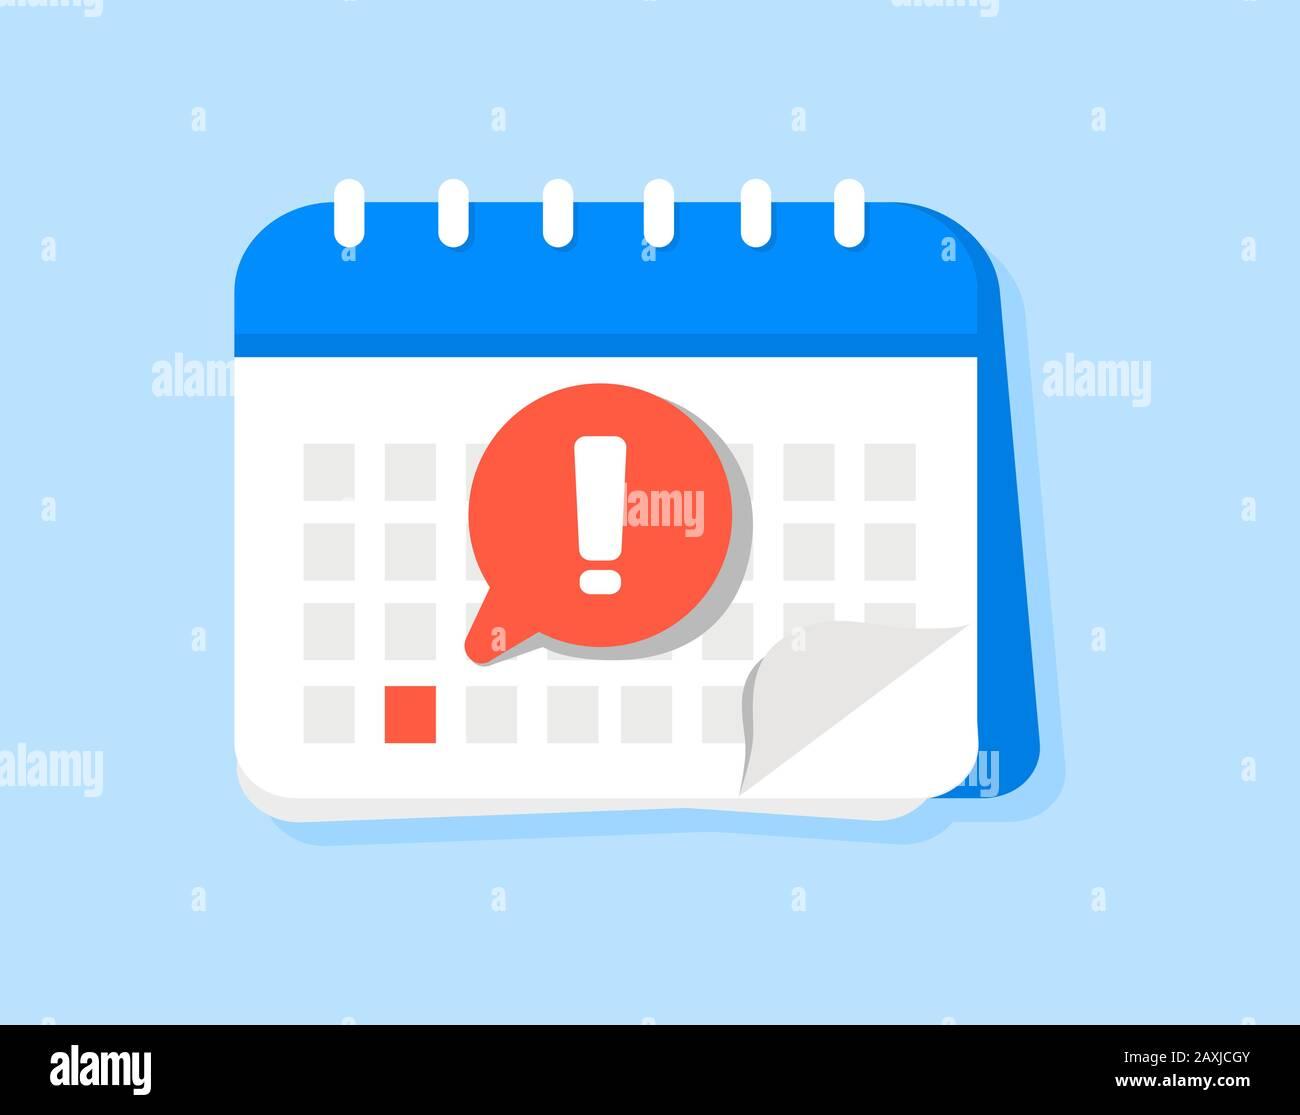 Icono de vector de calendario de fecha límite. Aviso o aviso de aviso de  evento de signo plano con evento importante seleccionado. Notificación de  mensaje de alerta activada Imagen Vector de stock -